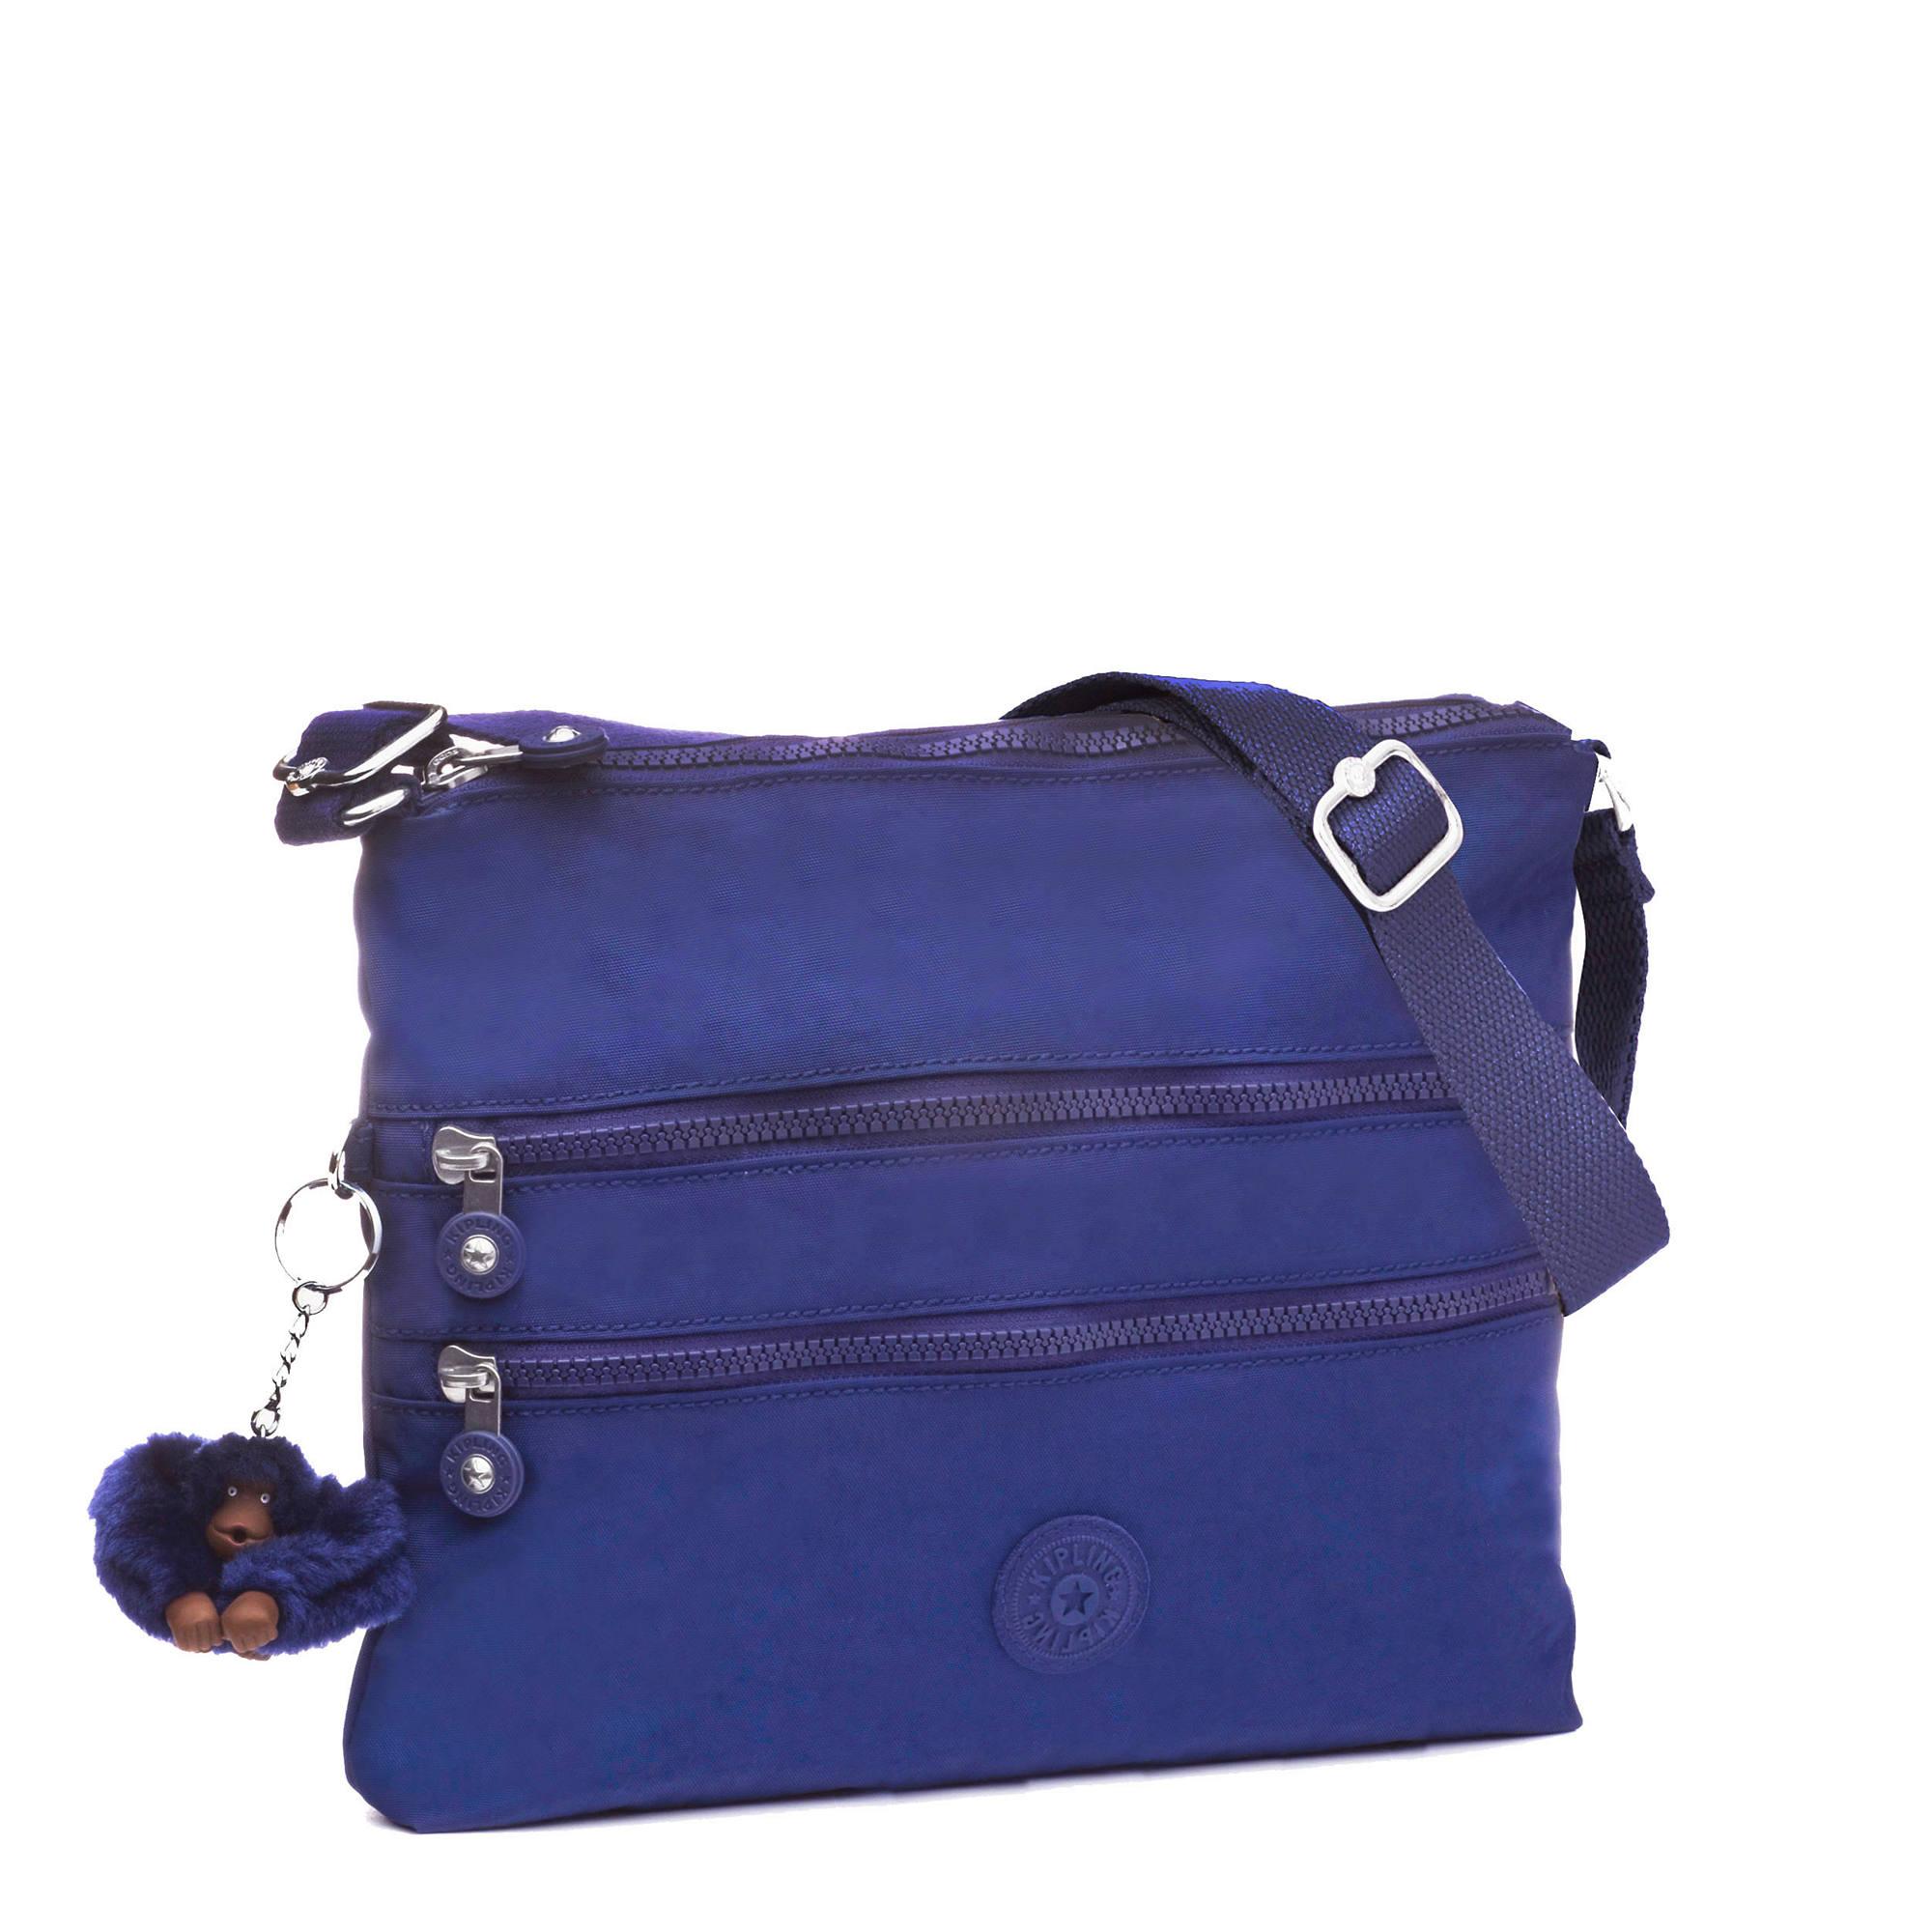 Kipling-Alvar-Metallic-Crossbody-Bag miniature 17